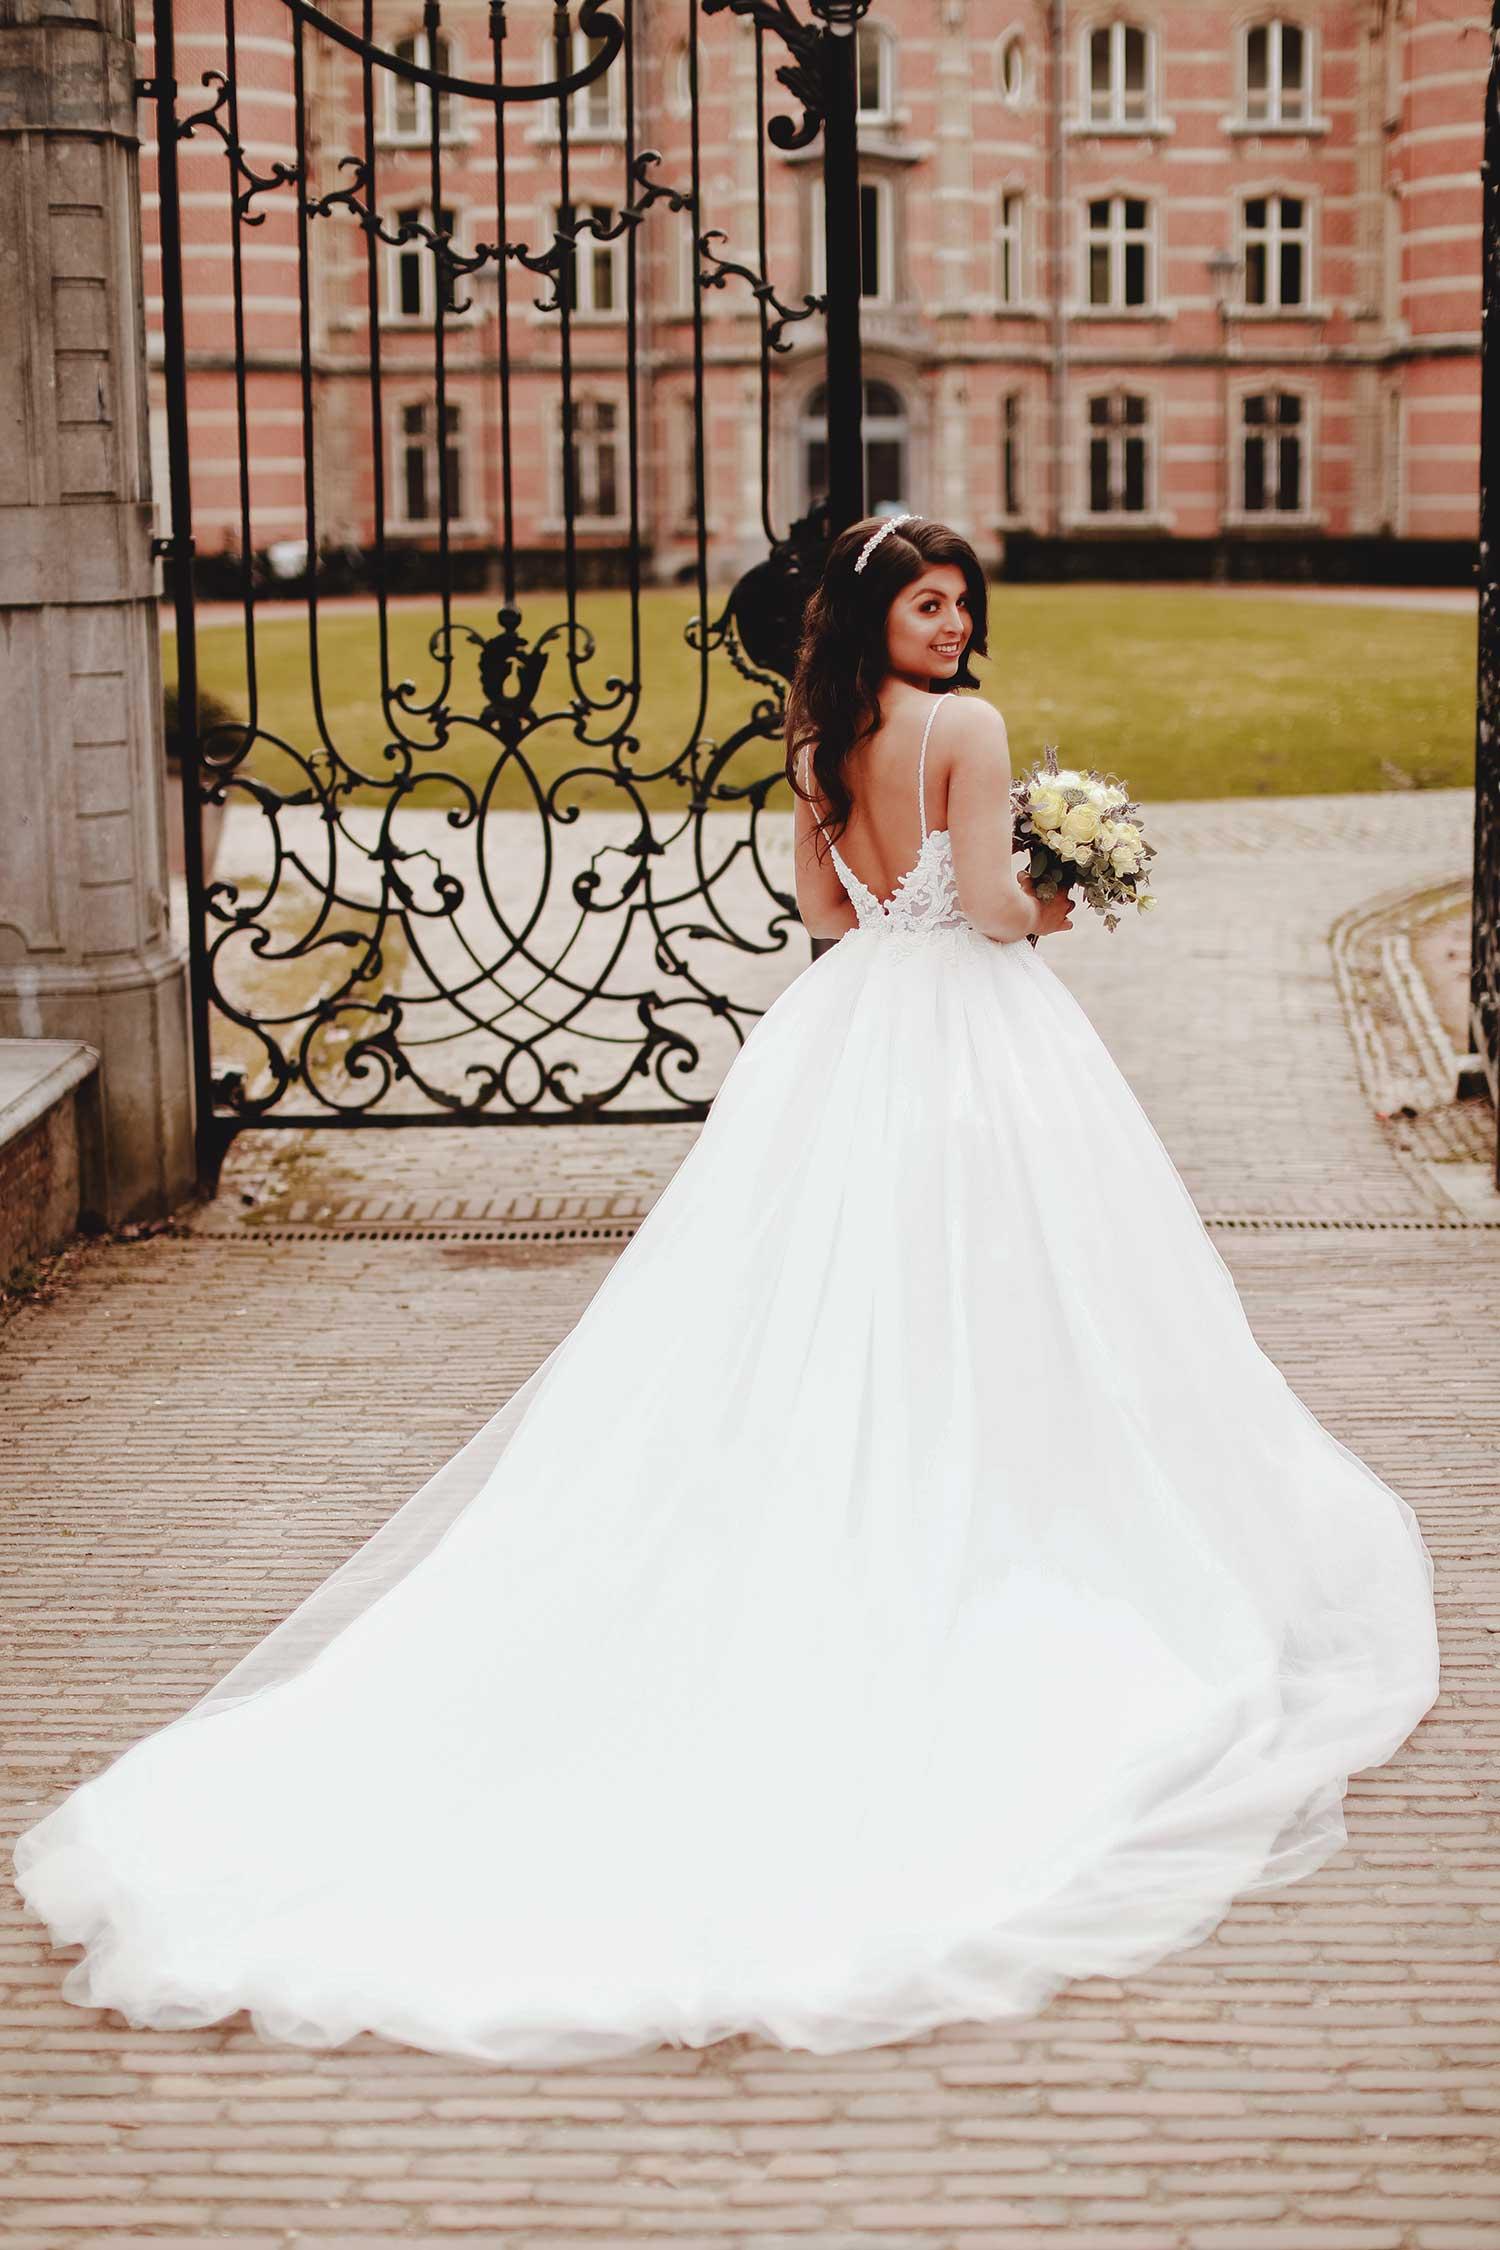 Real life princess bride